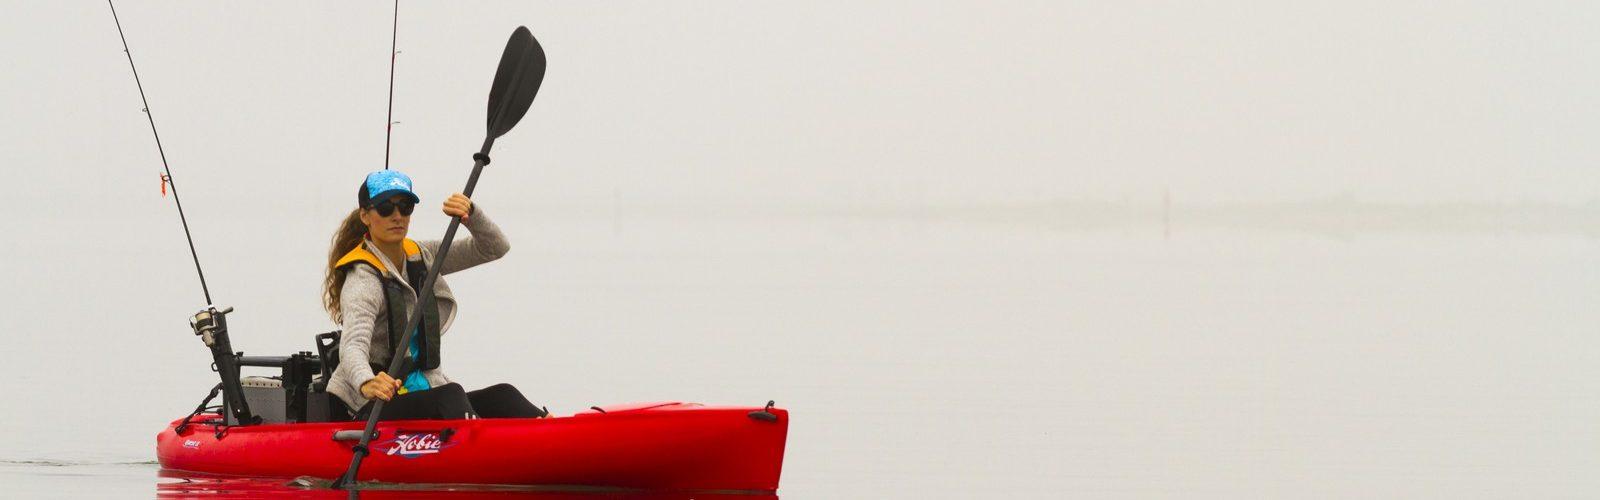 Quest11_fishing_foggy_Joy_red_paddling_8948_full_jpg_1600x1600__generated